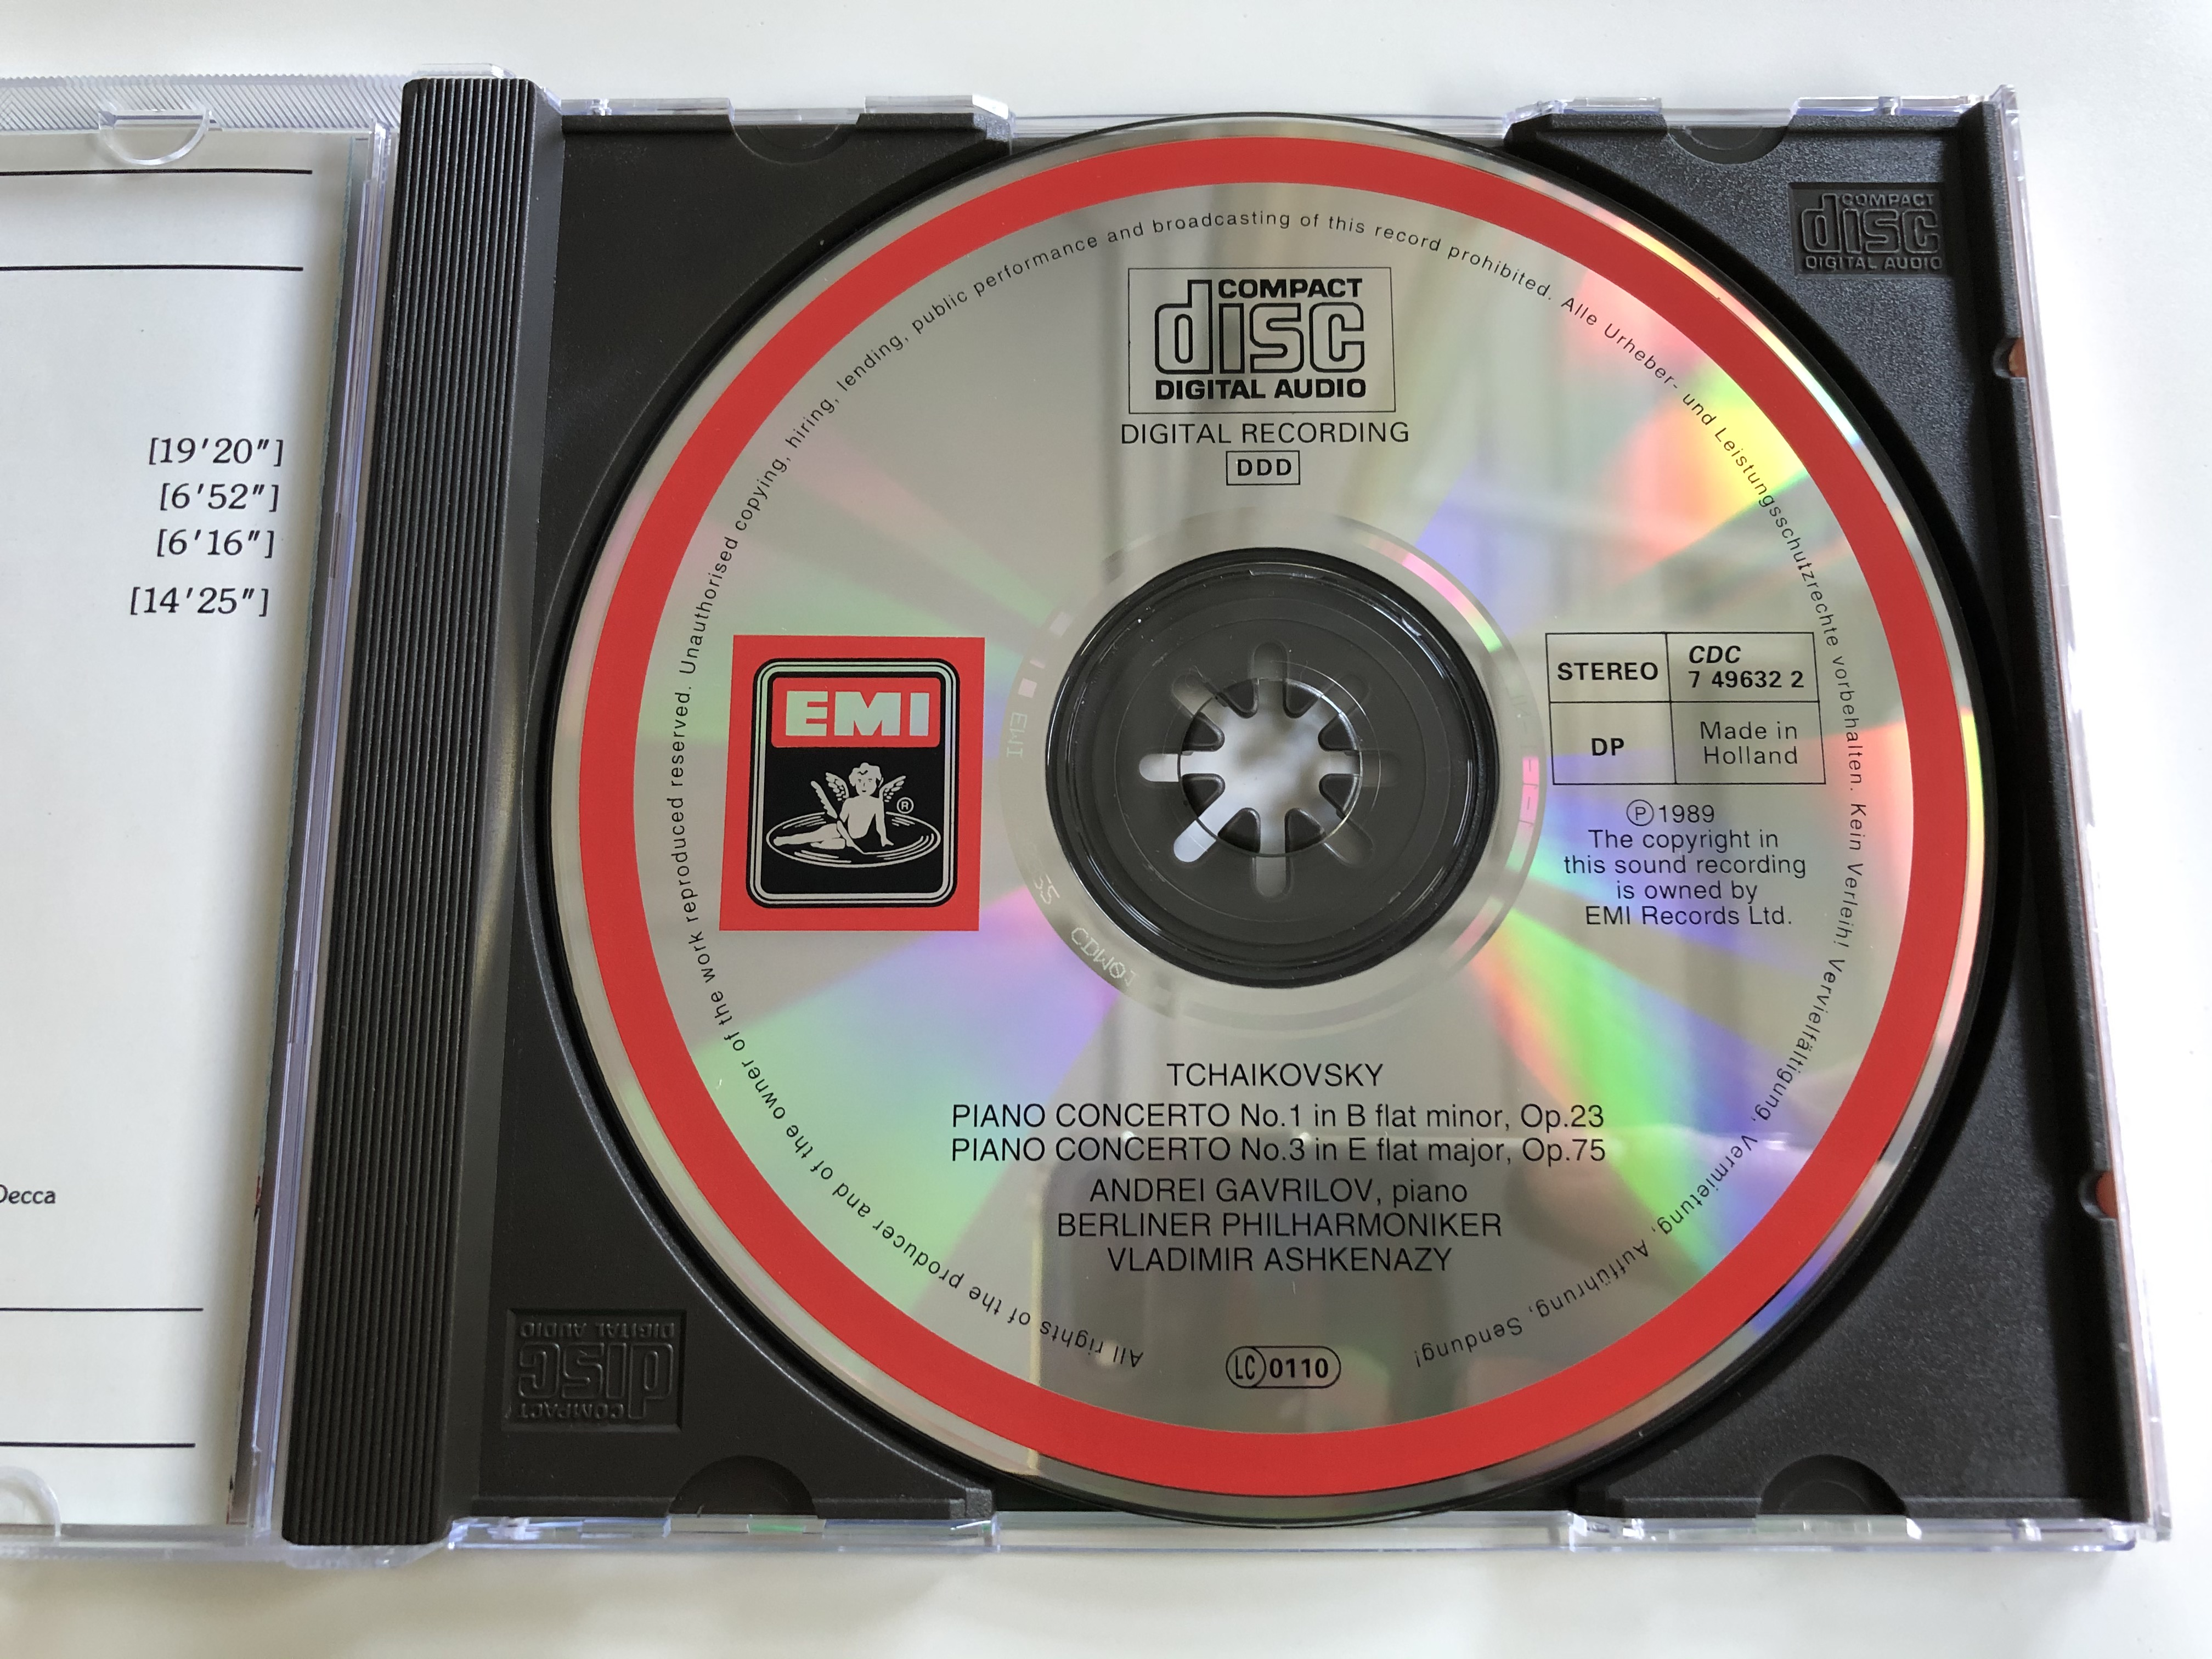 tchaikovsky-piano-concertos-klavierkonzerte-concertos-pour-piano-1-3-andrei-gavrilov-berliner-philharmoniker-vladimir-ashkenazy-emi-audio-cd-1989-stereo-cdc-7-49632-2-4-.jpg